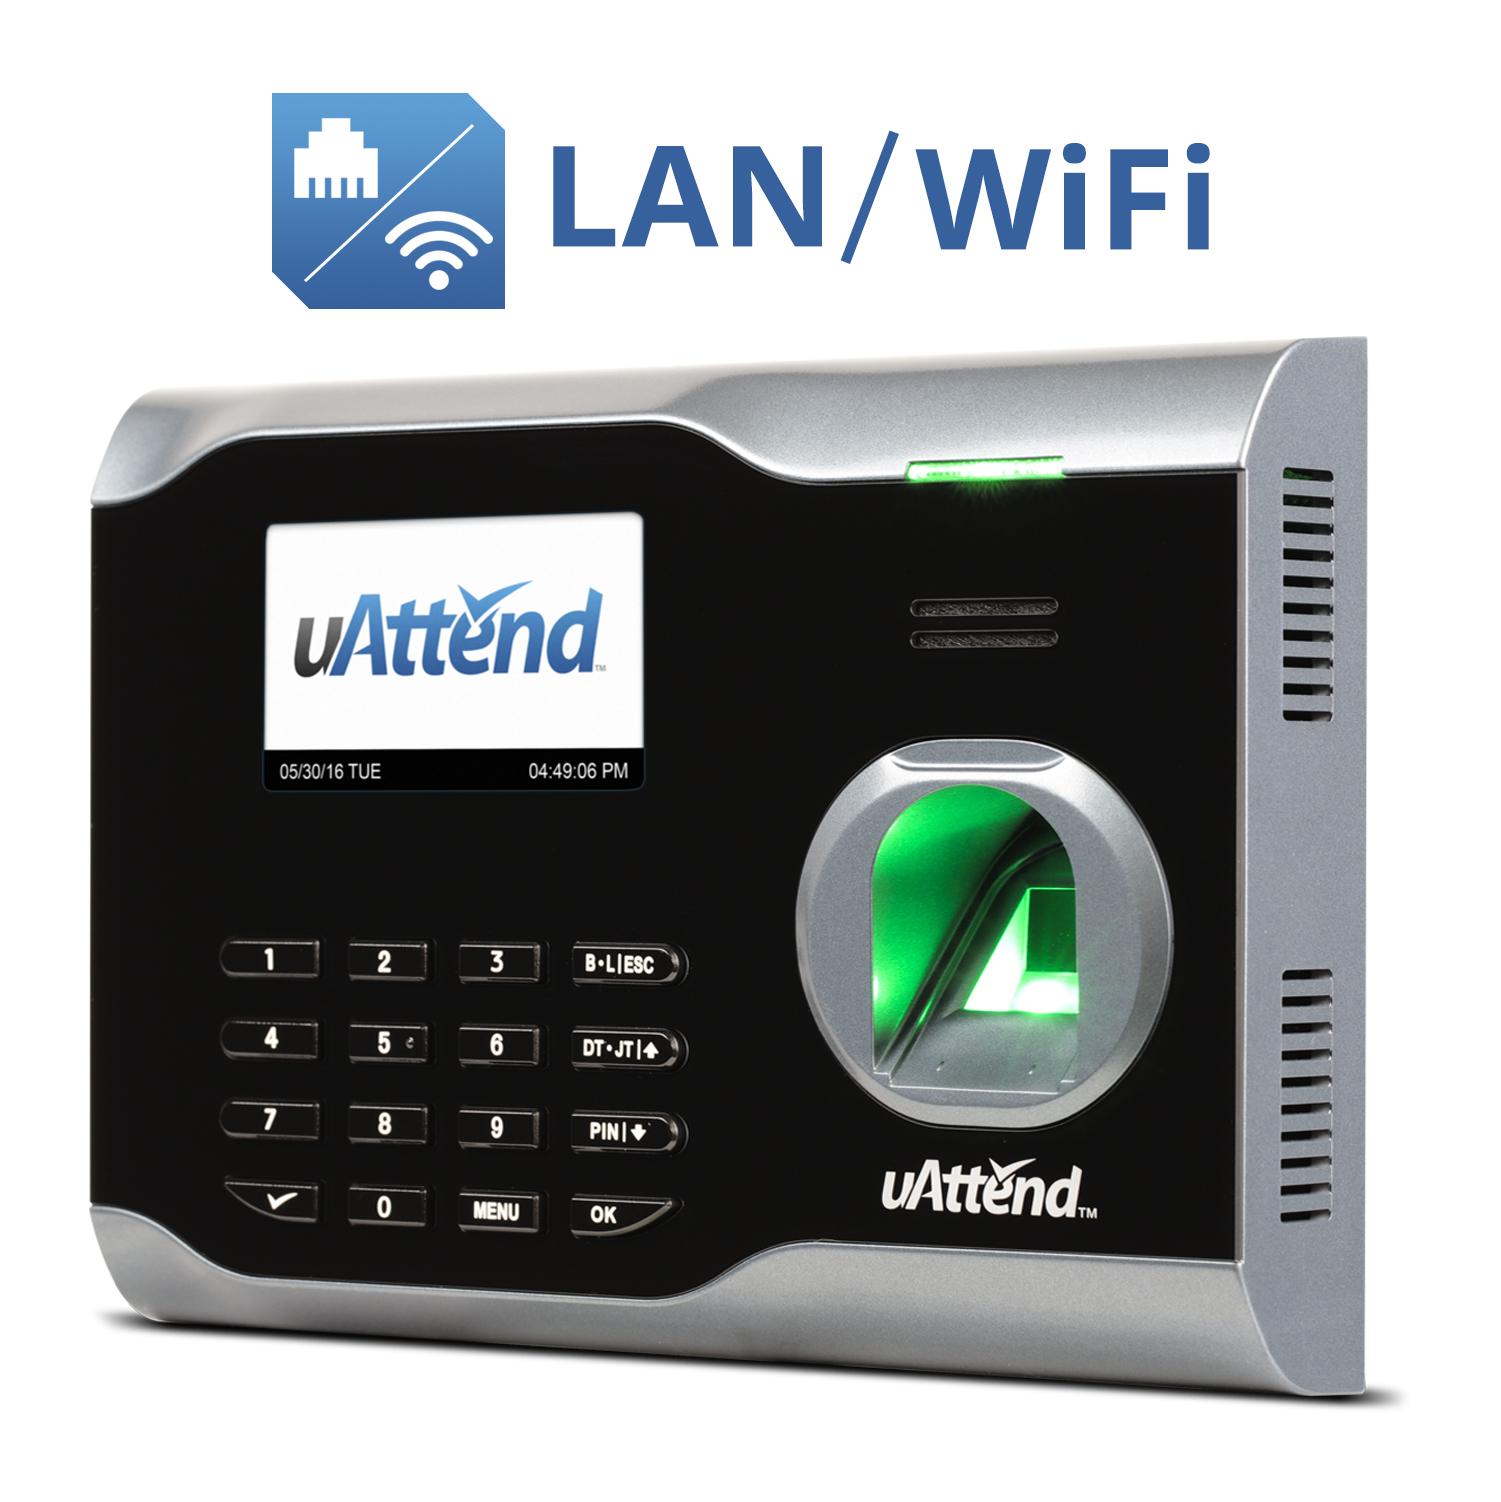 uAttend Demo - uAttend Biometric Fingerprint WiFi Time Clock